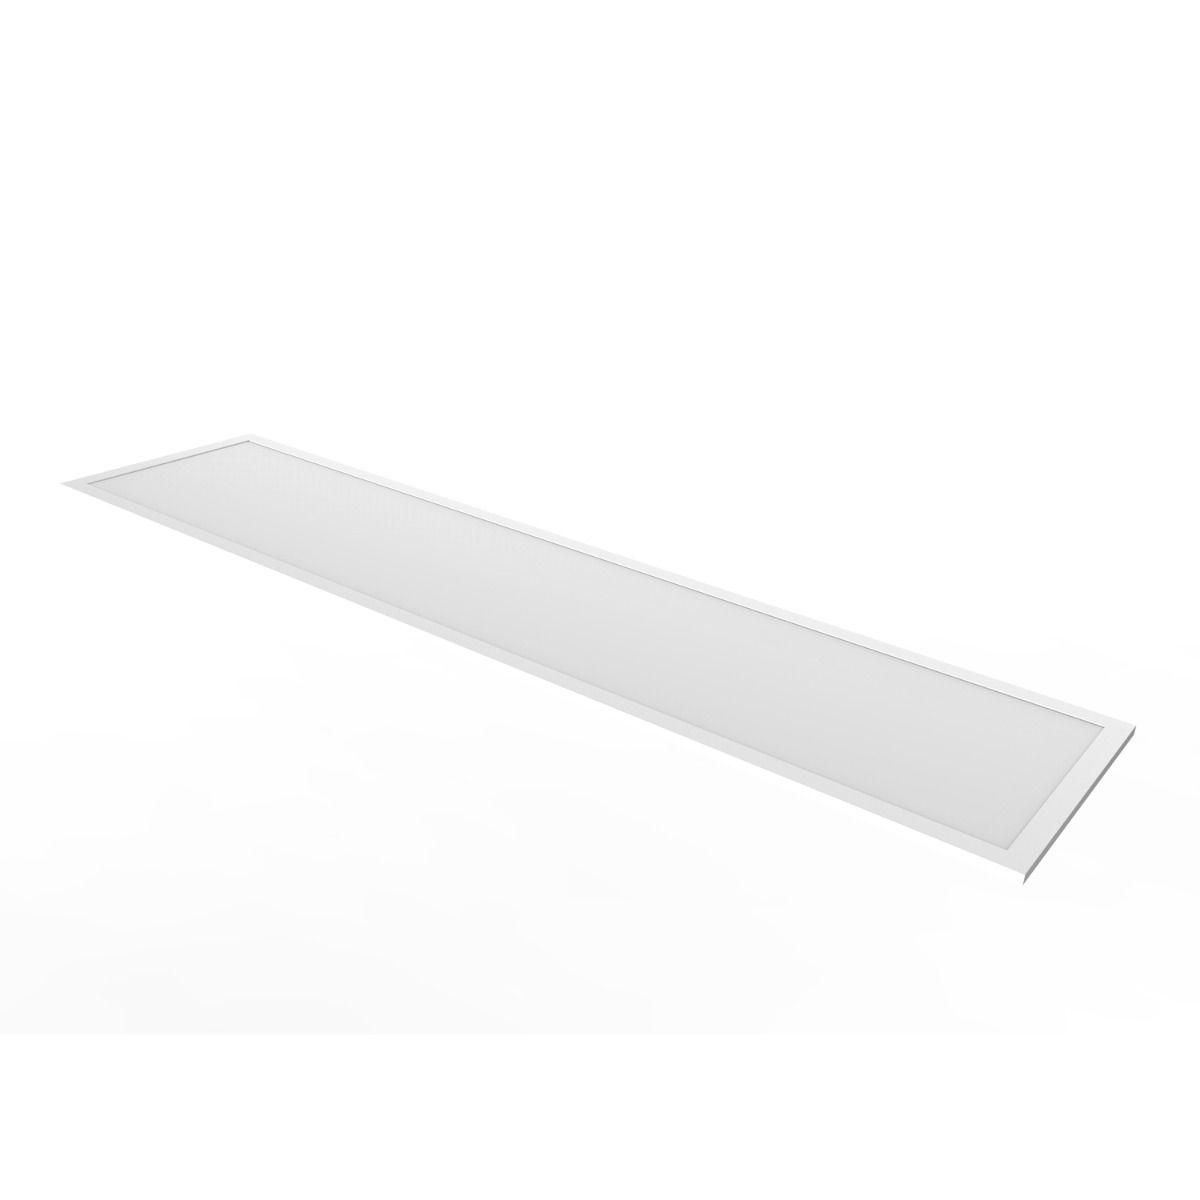 Noxion LED Panel Ecowhite V2.0 30x120cm 4000K 36W UGR <22 | Cool White - Replaces 2x36W